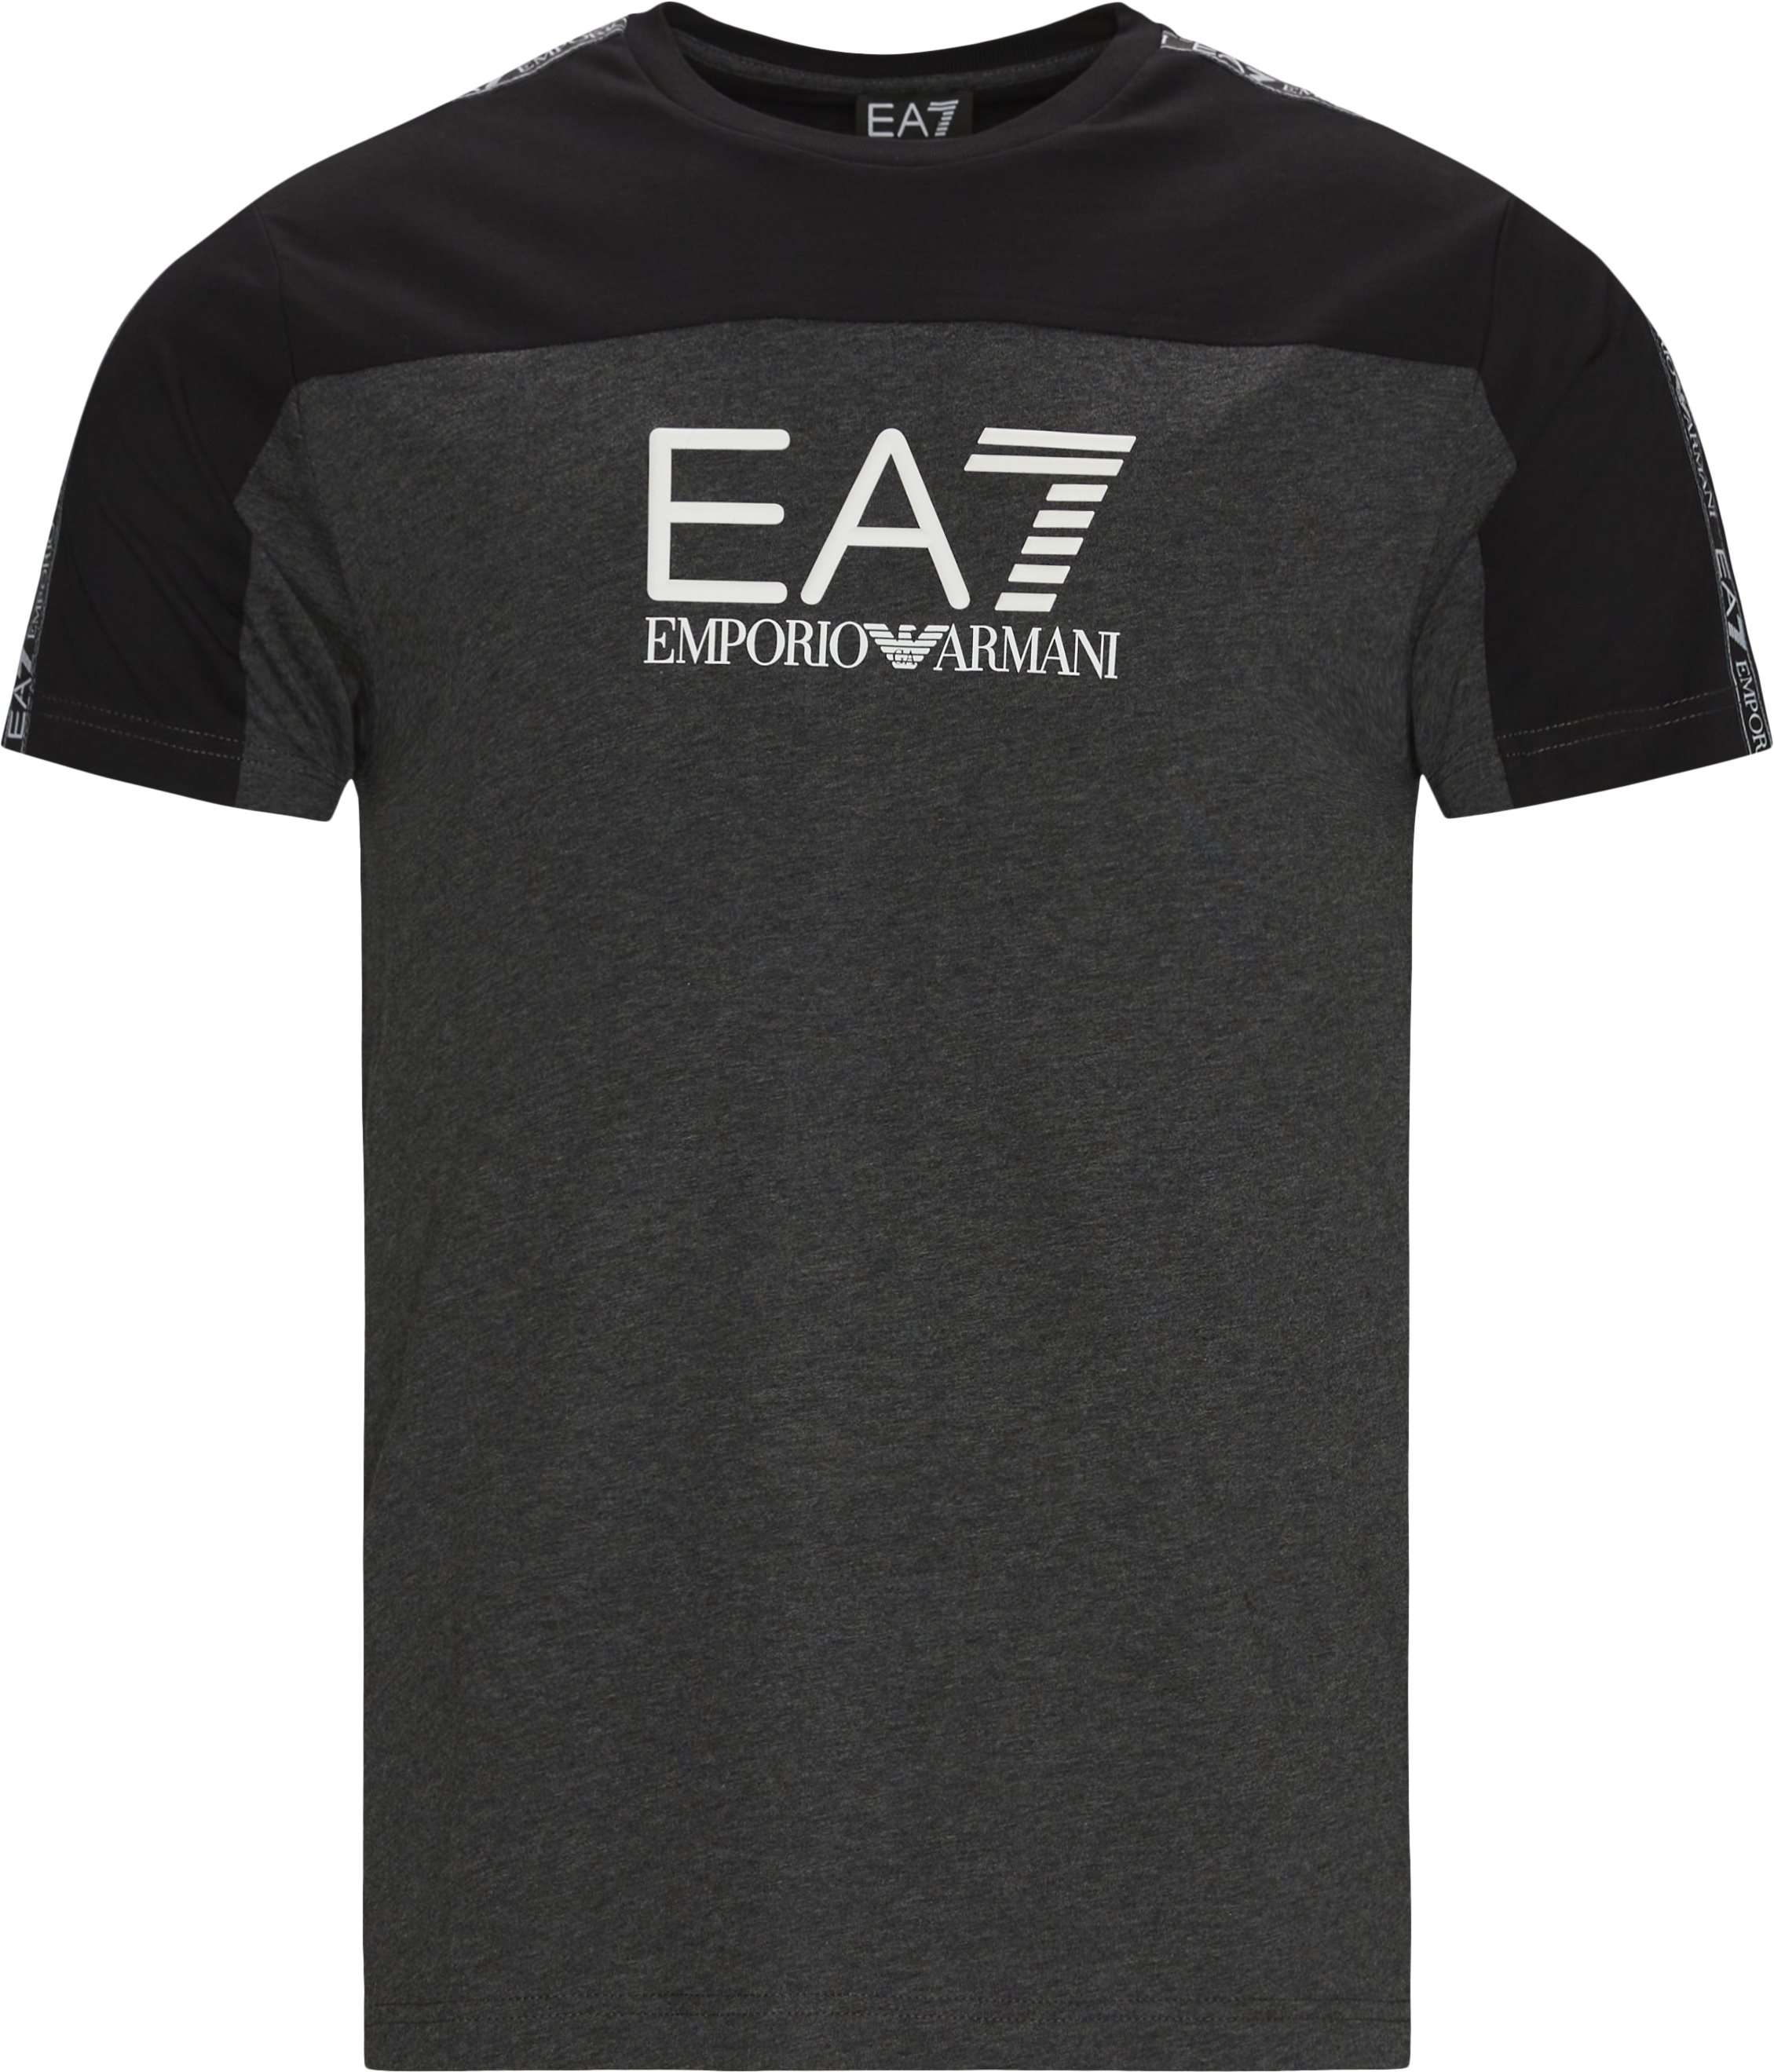 PJ7CZ Logo T-shirt - T-shirts - Regular fit - Grå